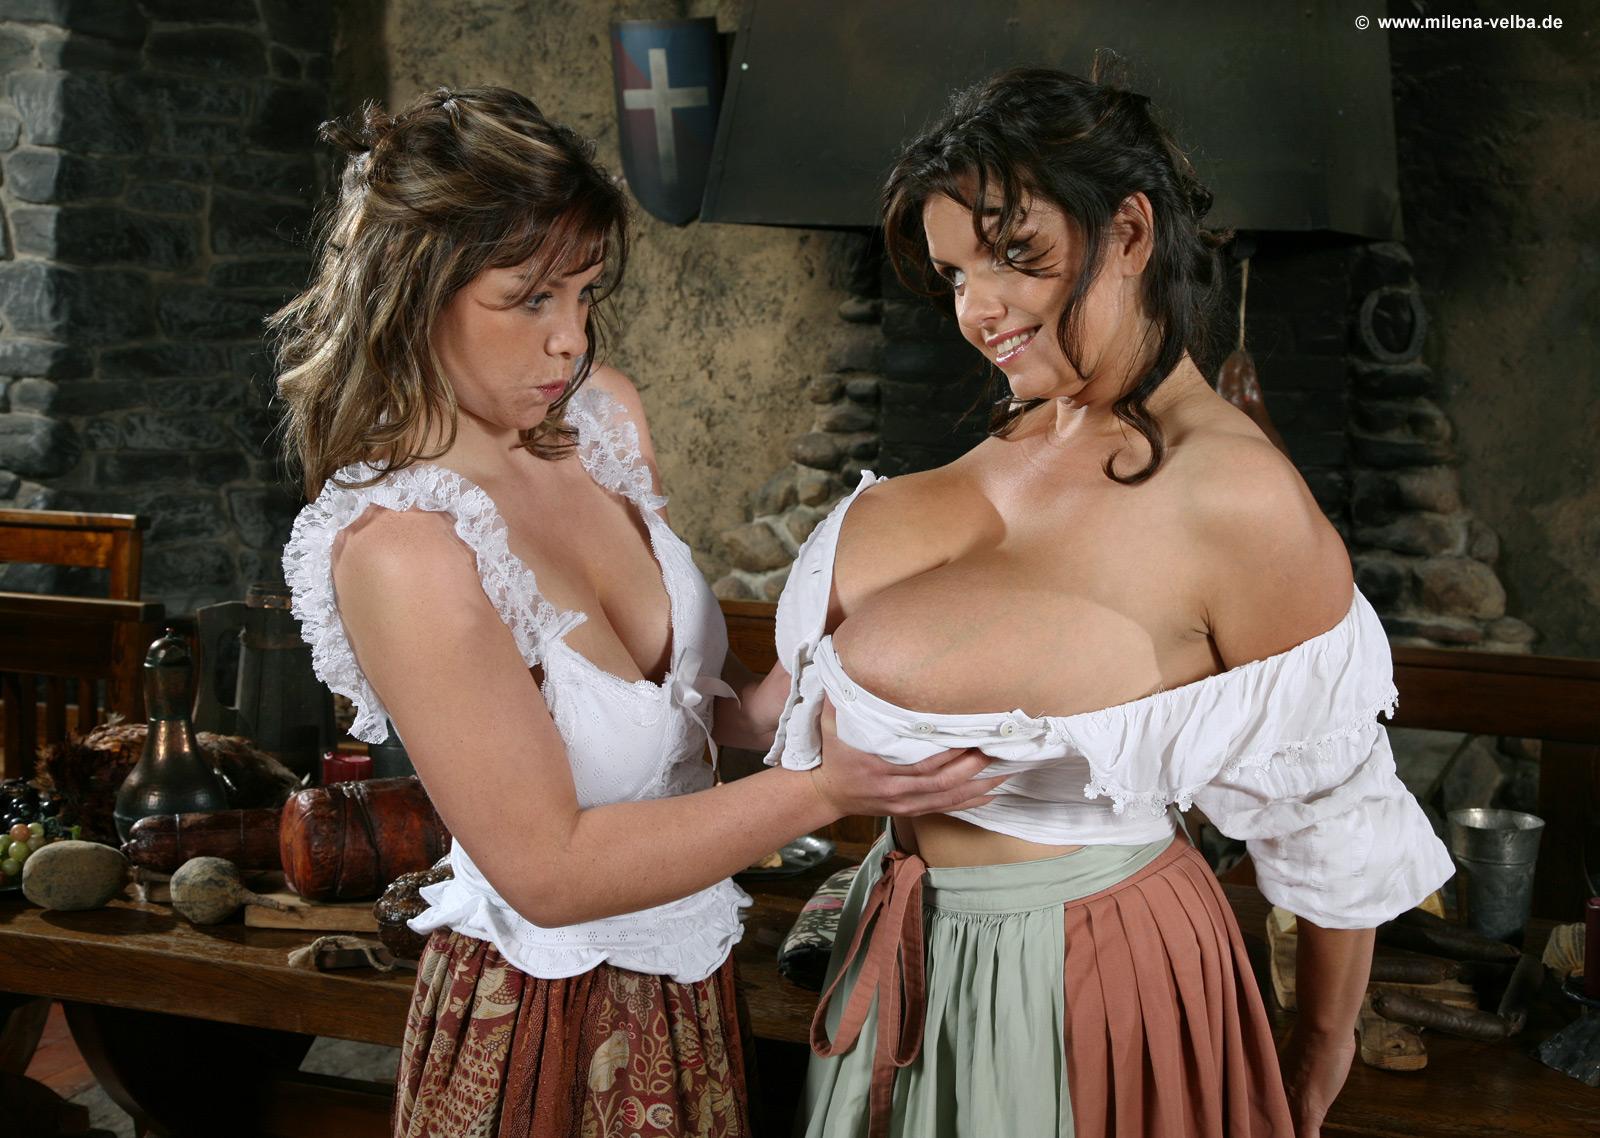 Nude lesbian porn videos